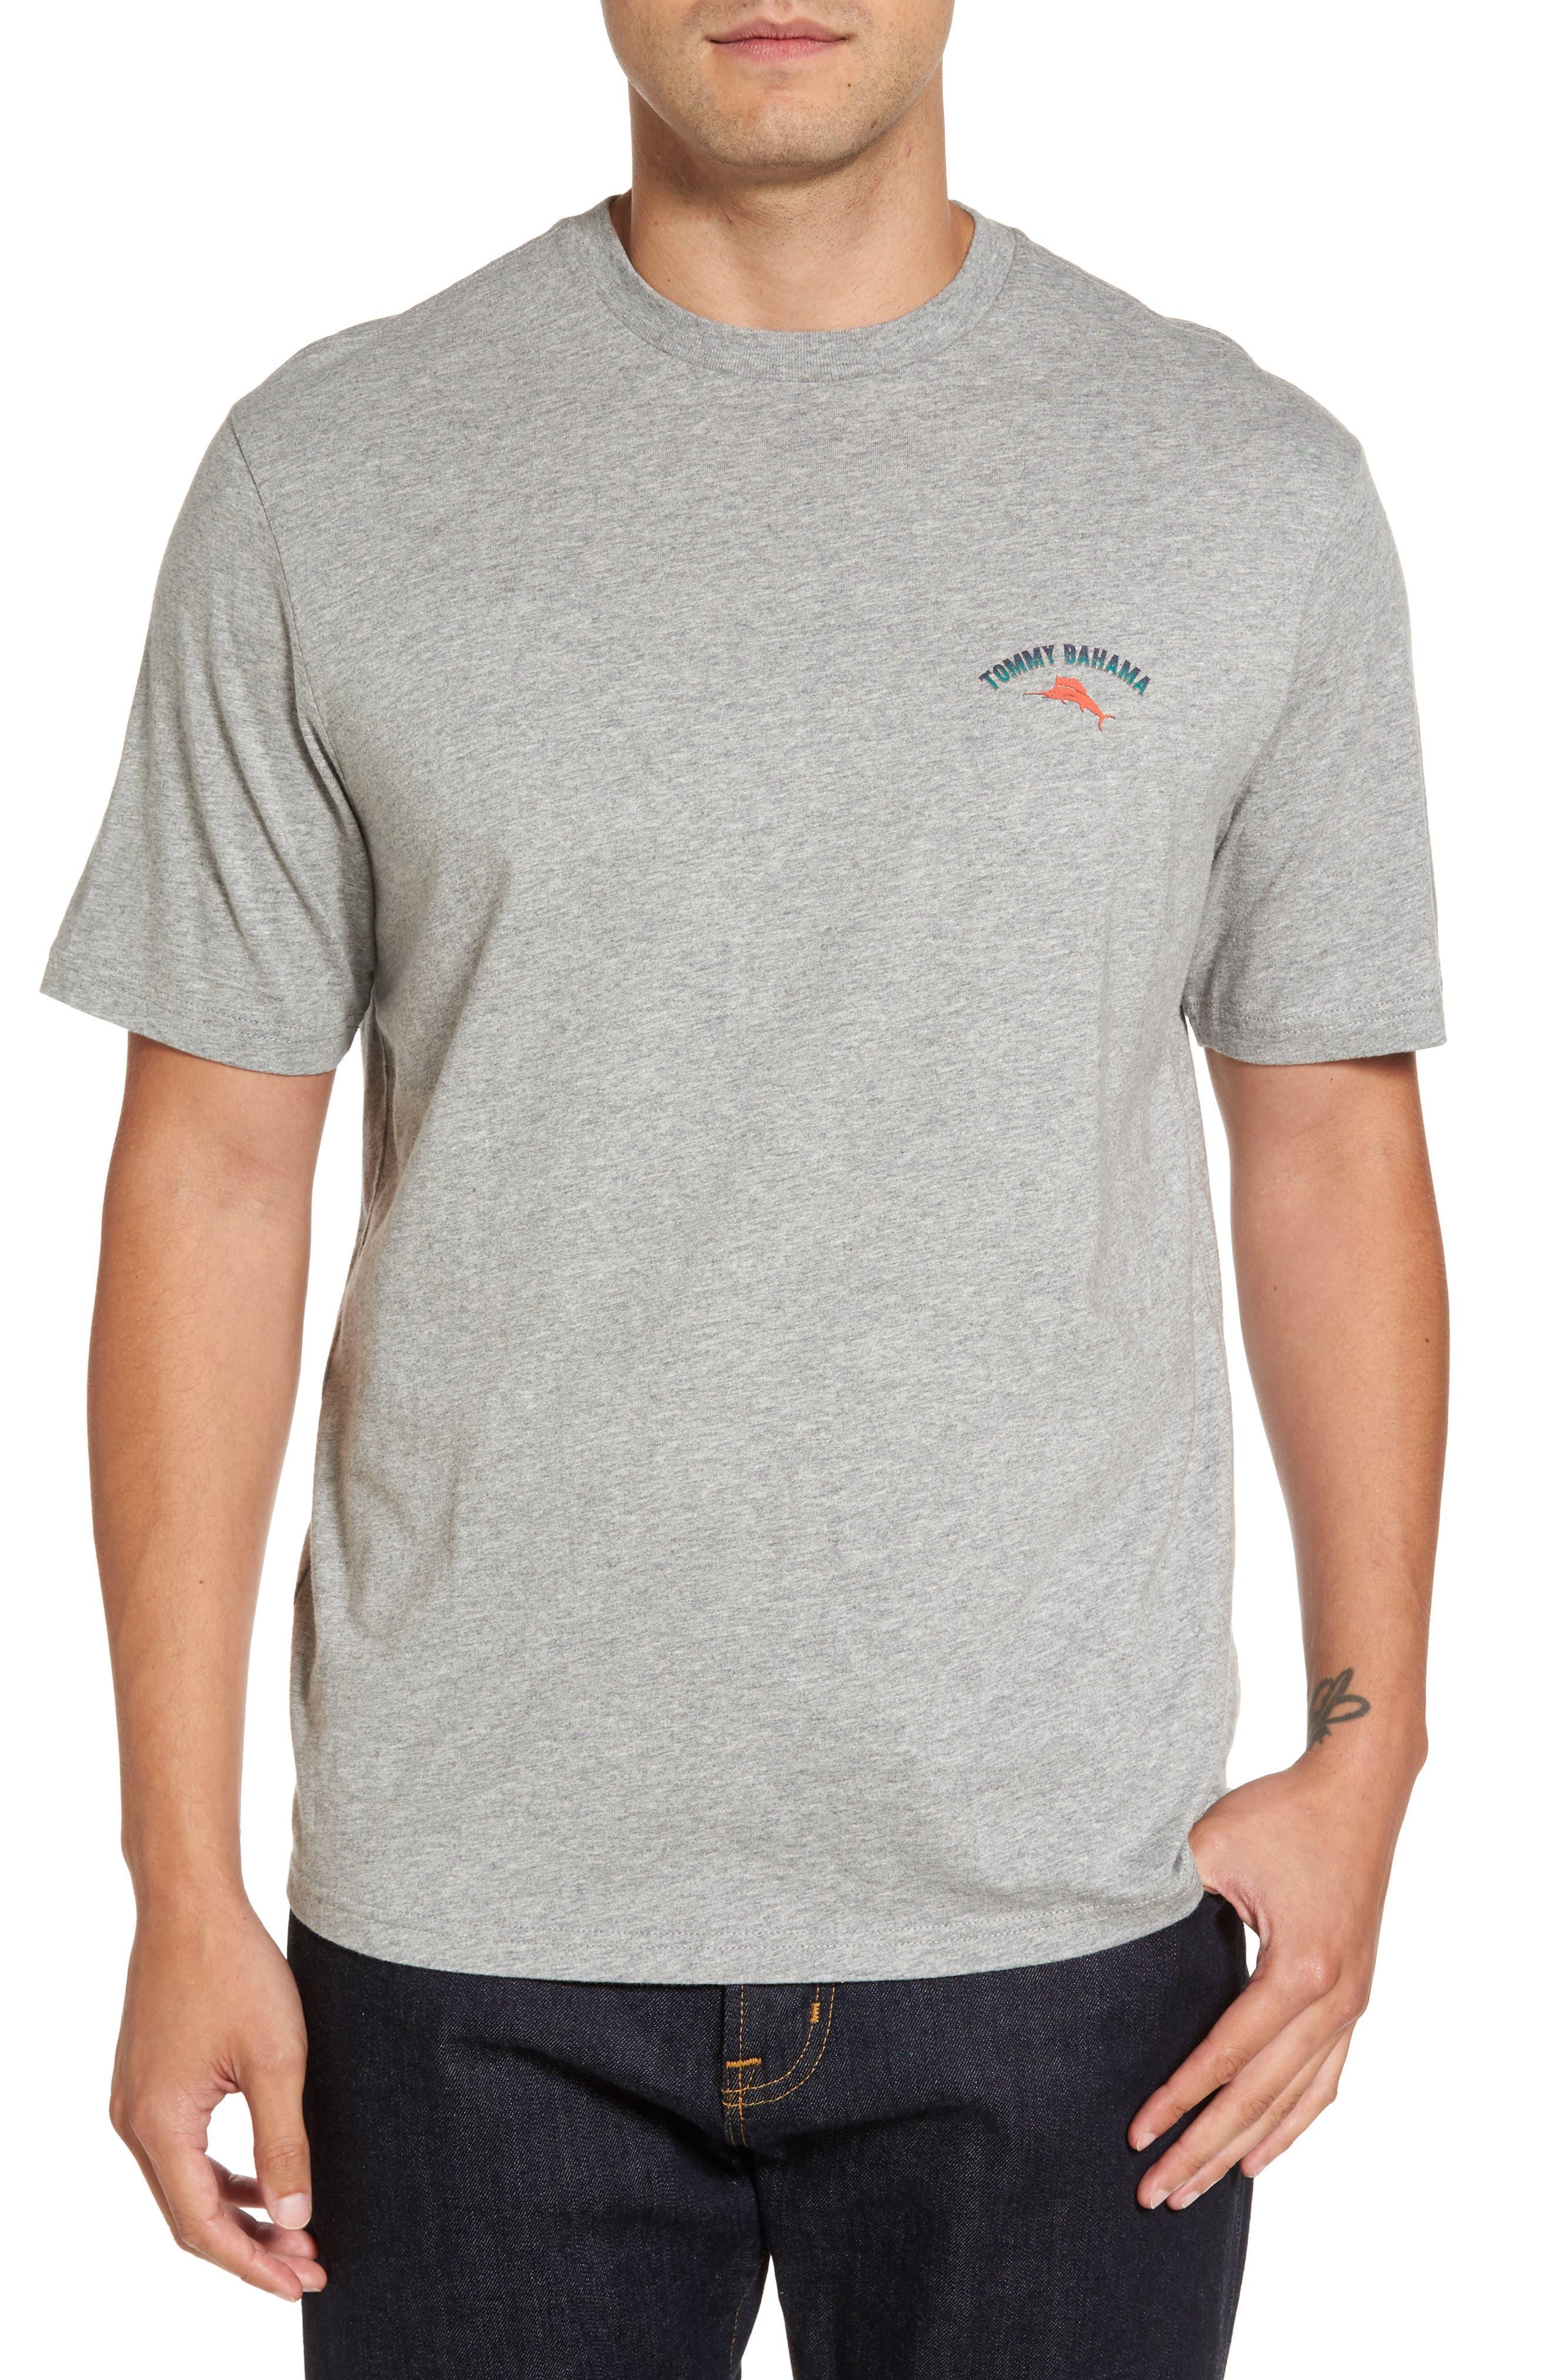 Main Image - Tommy Bahama Outside Limebacker Standard Fit T-Shirt